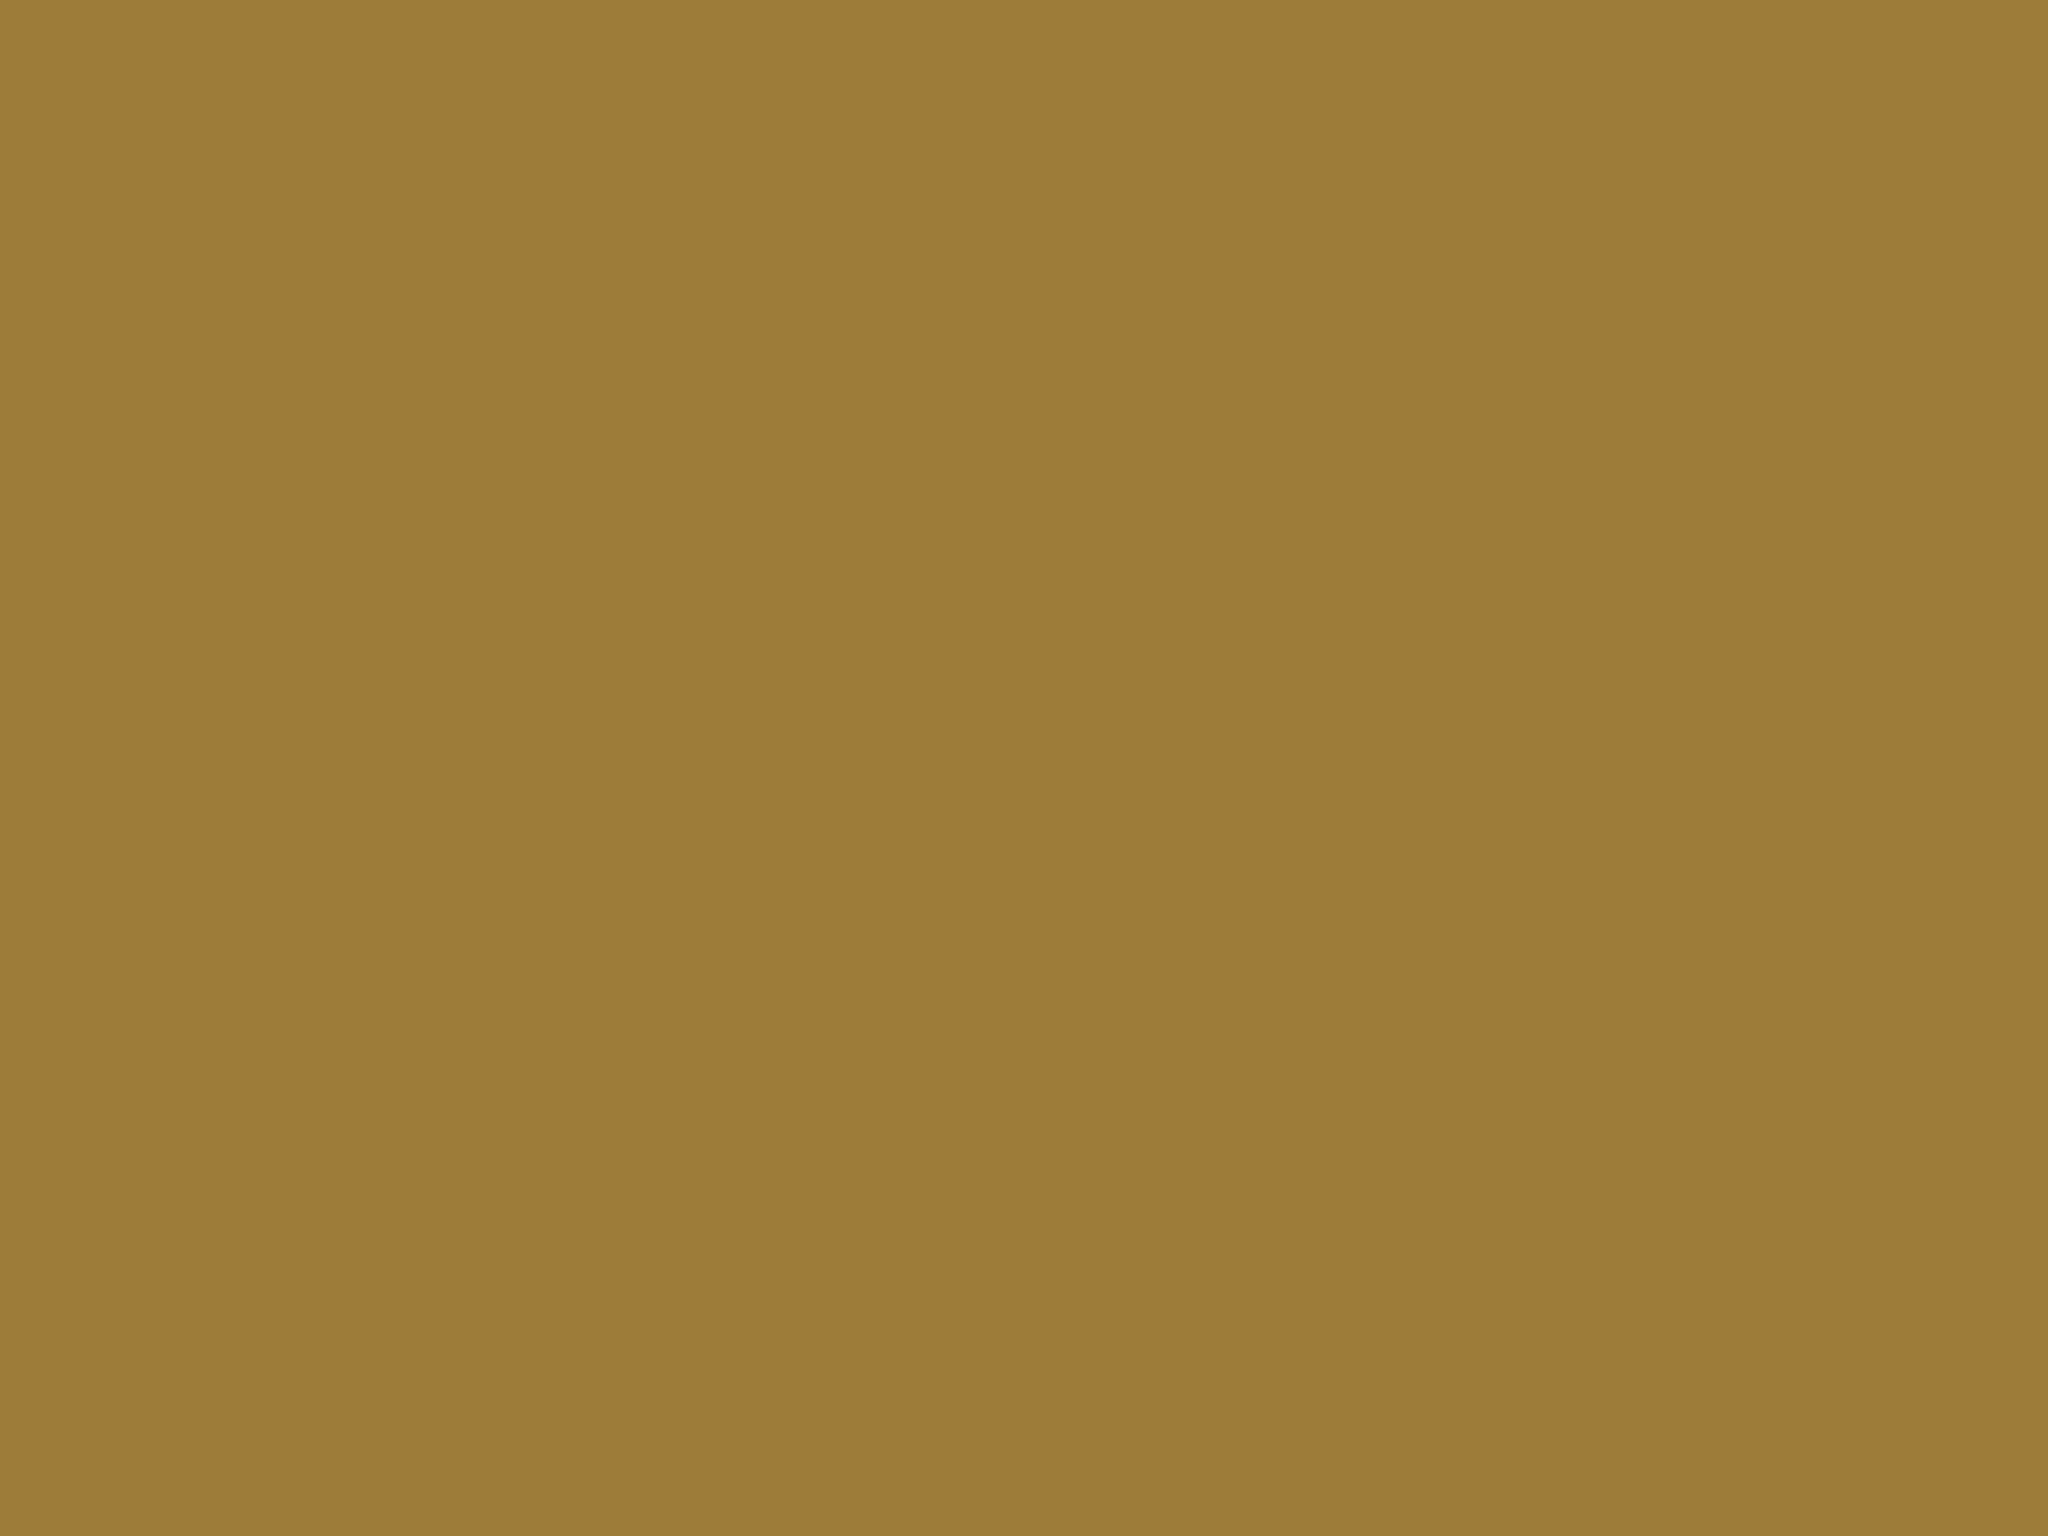 2048x1536 Metallic Sunburst Solid Color Background